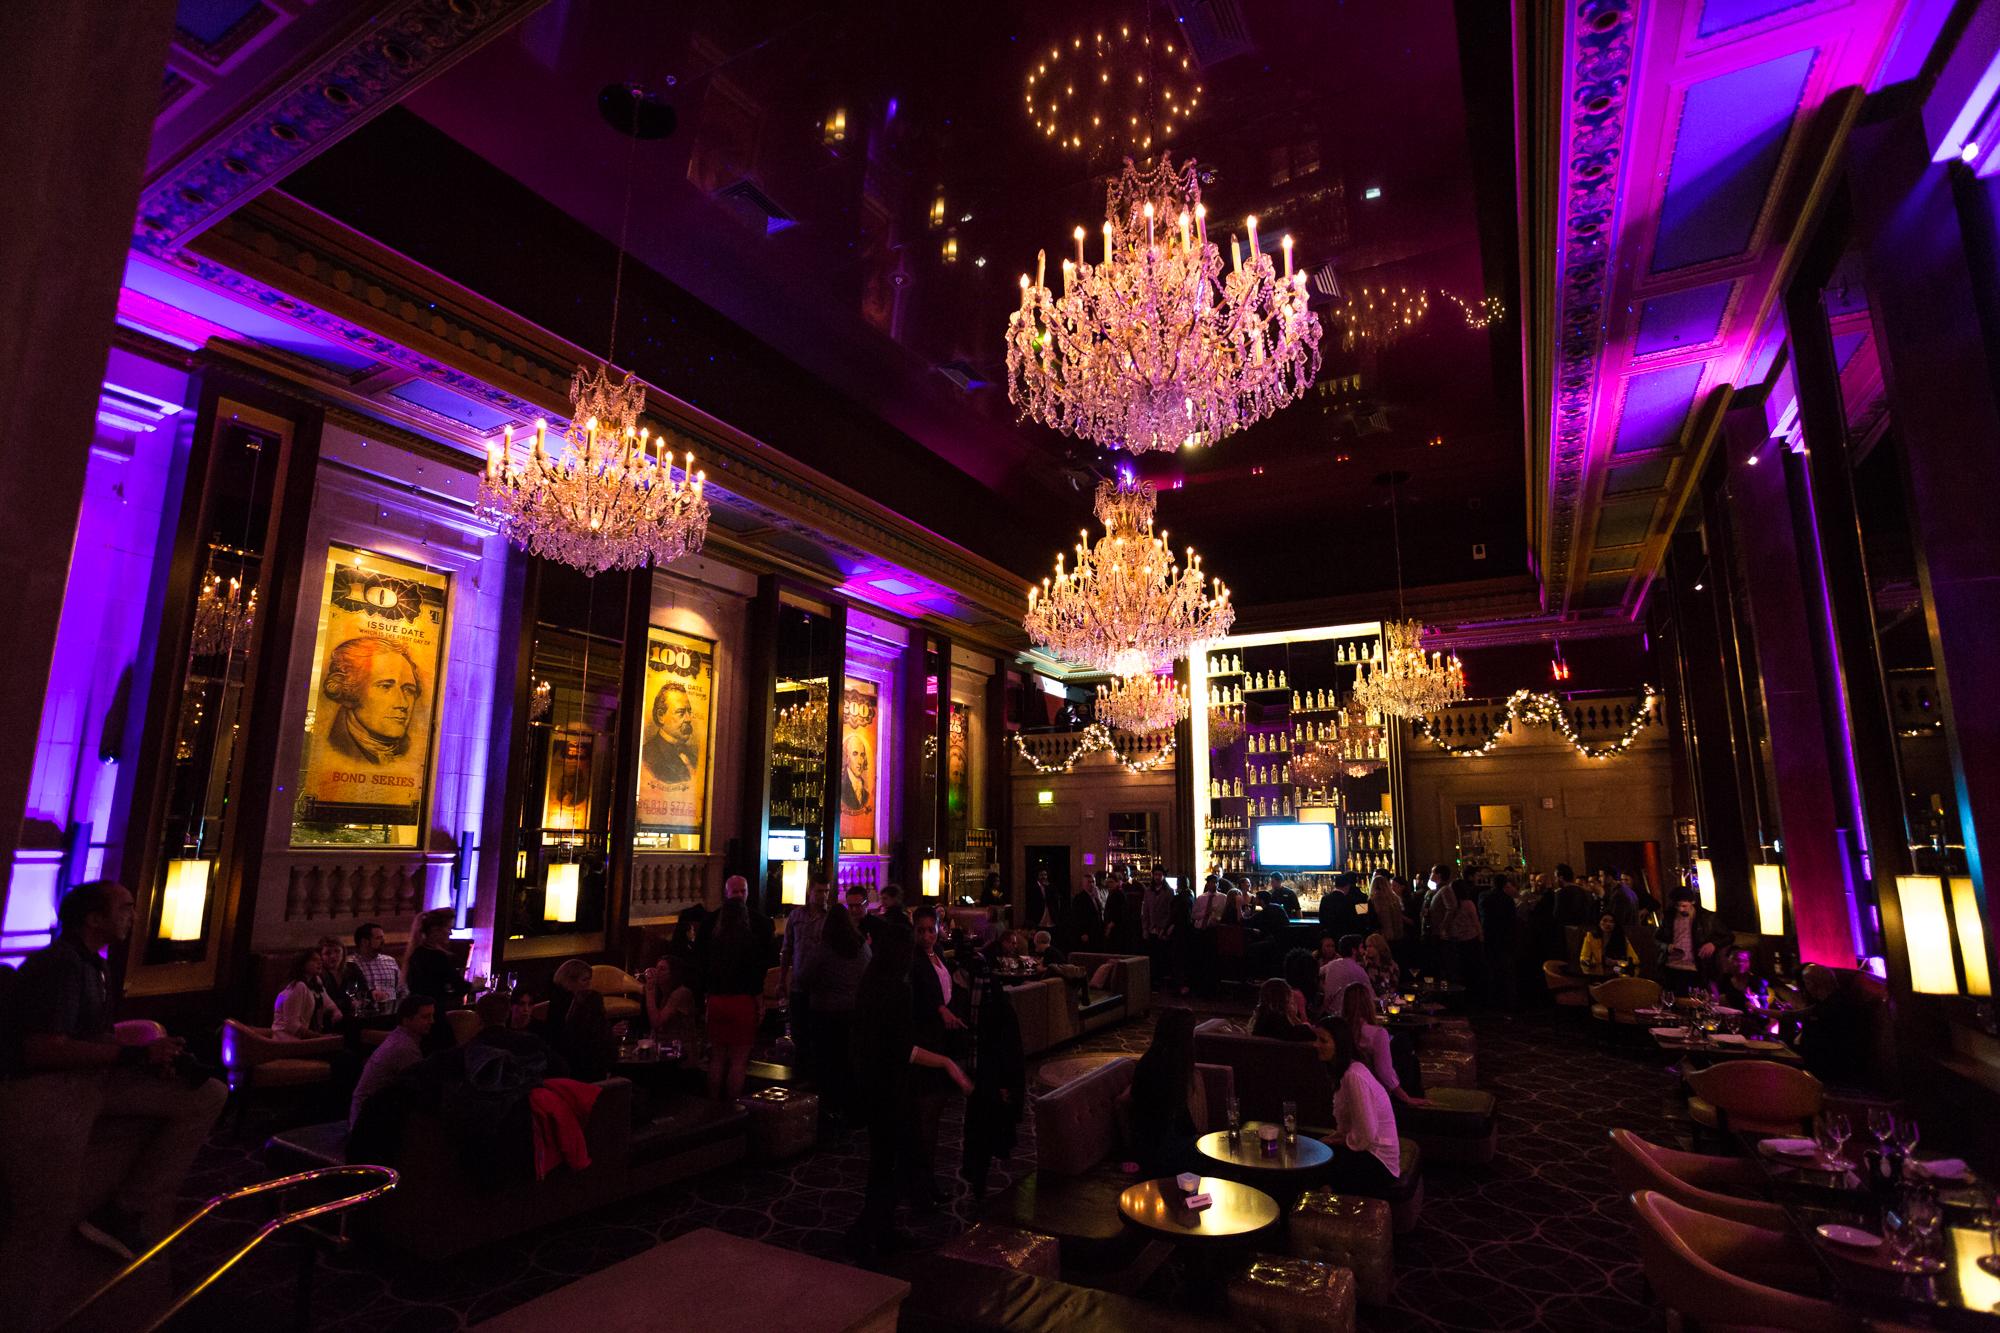 BOND Restaurant & Lounge. Image by CDA Media.